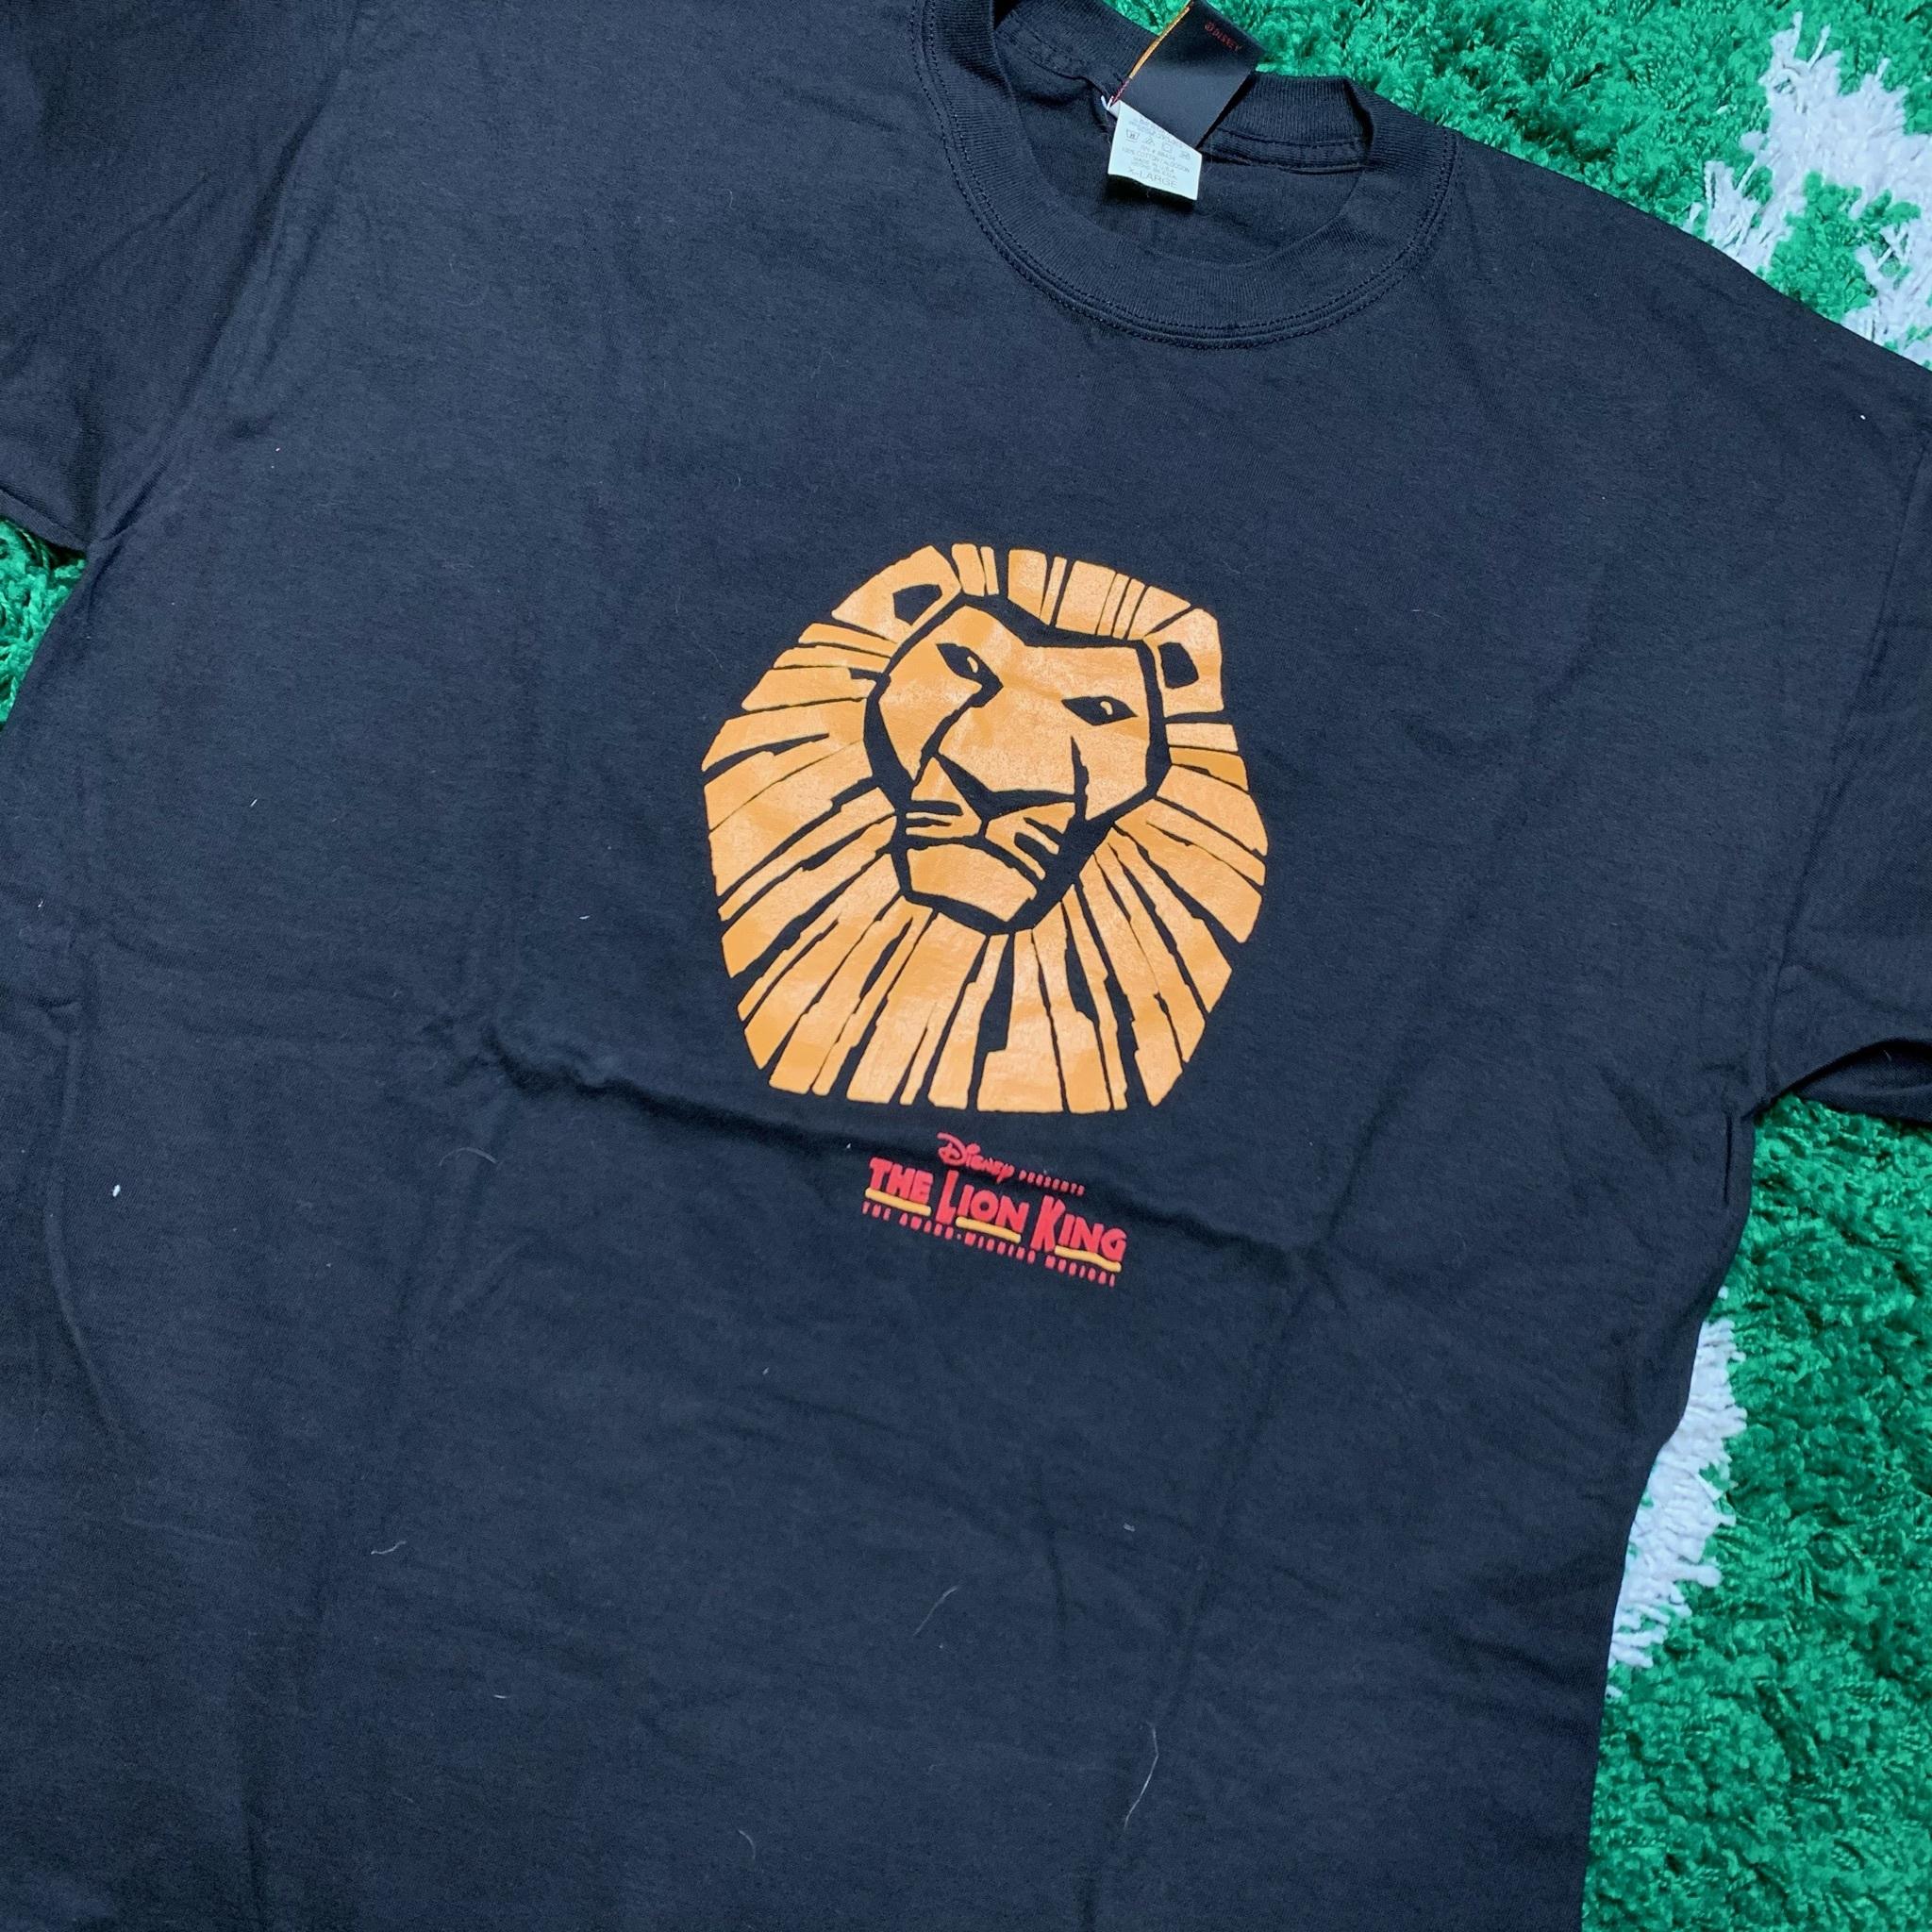 Marque RED WAGON T-Shirt Manches Courtes Im Not Lazy Gar/çon